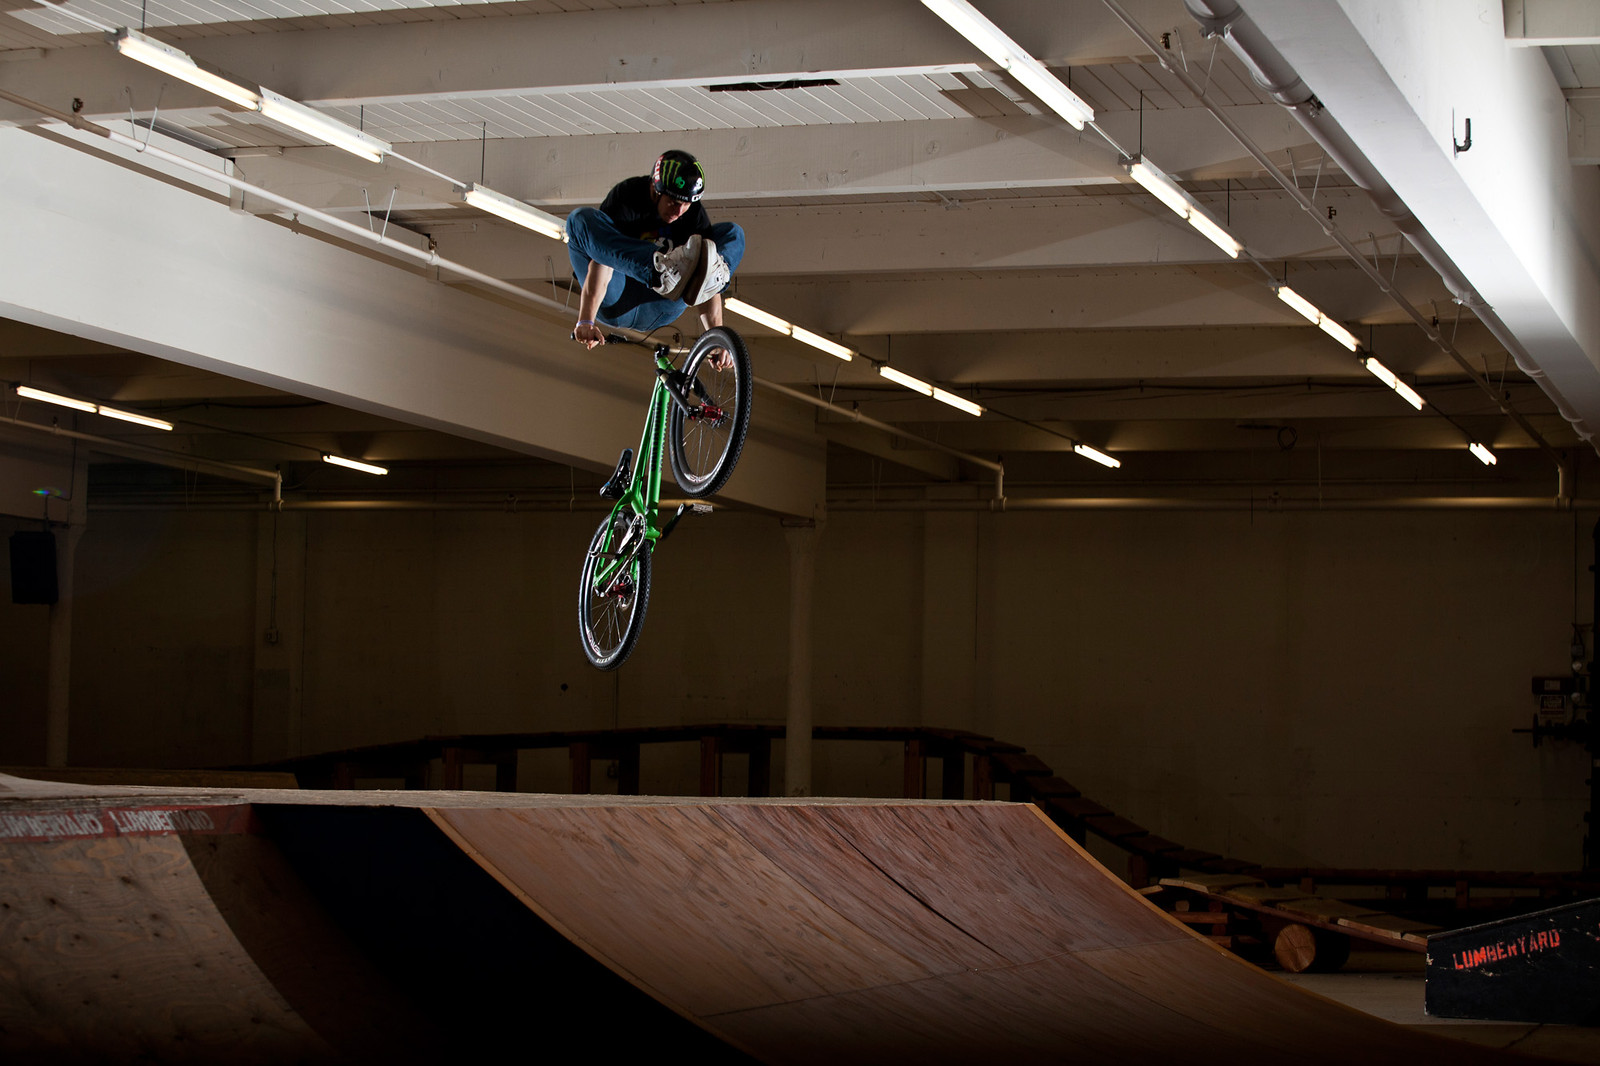 Jamie goldman lumberyard heelclicker - Jamie Goldman - Mountain Biking Pictures - Vital MTB